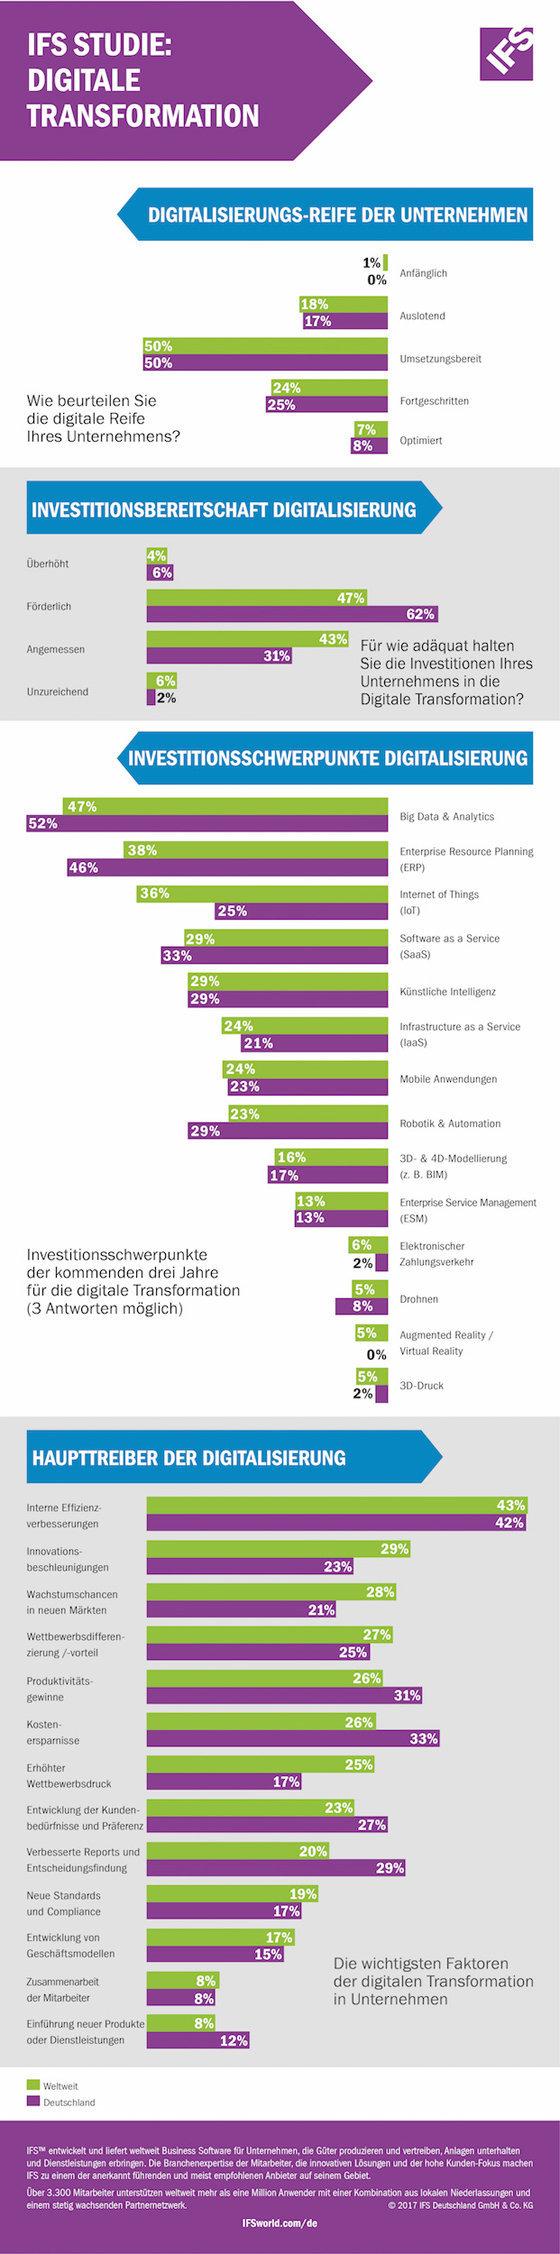 IFS Digital Survey